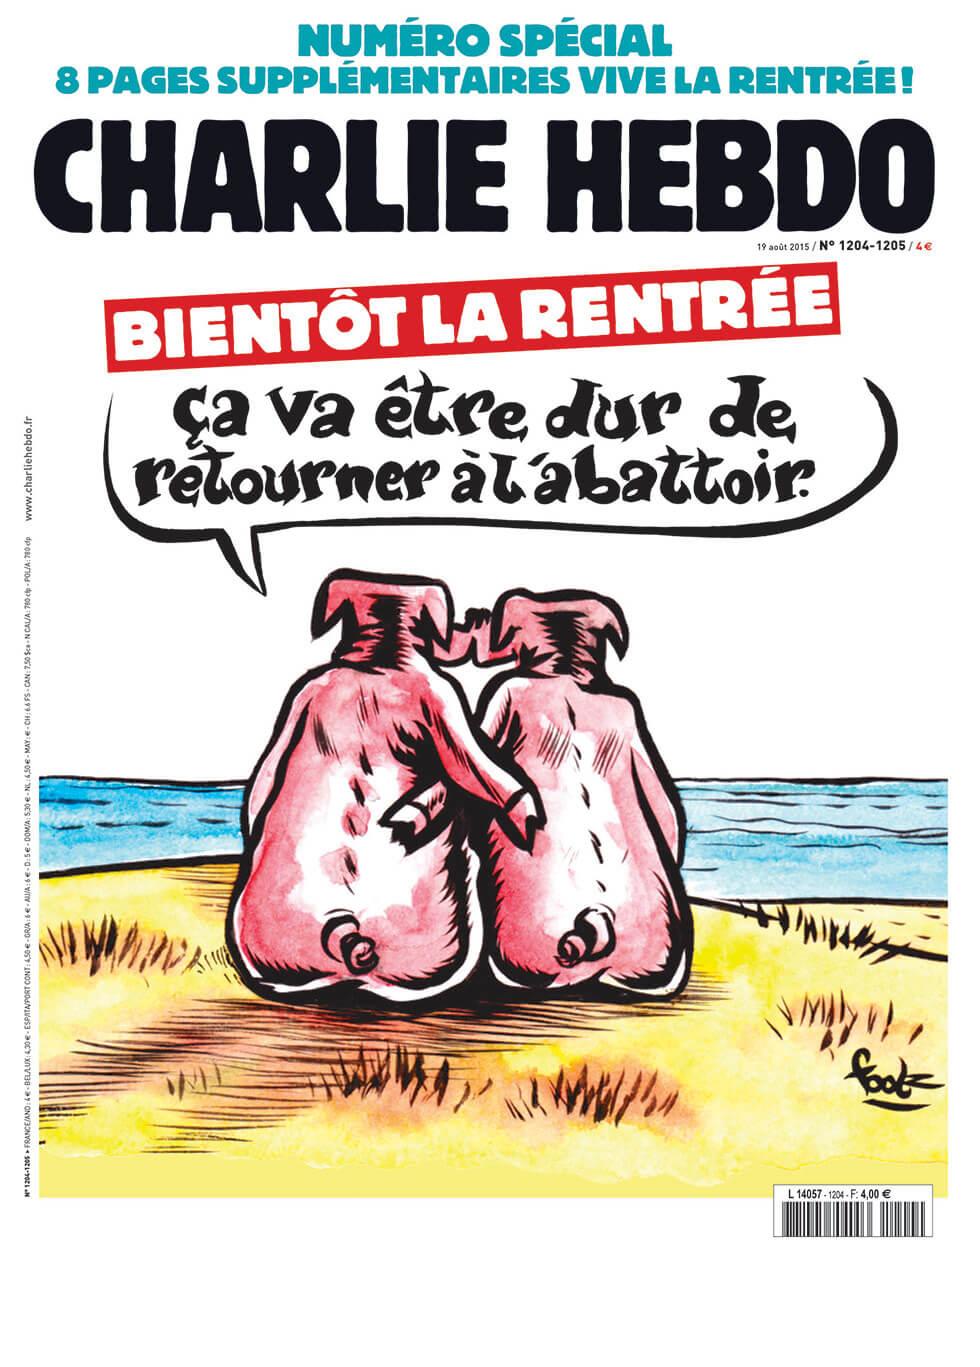 Charlie Hebdo n°1204-1205 --- 19 août 2015